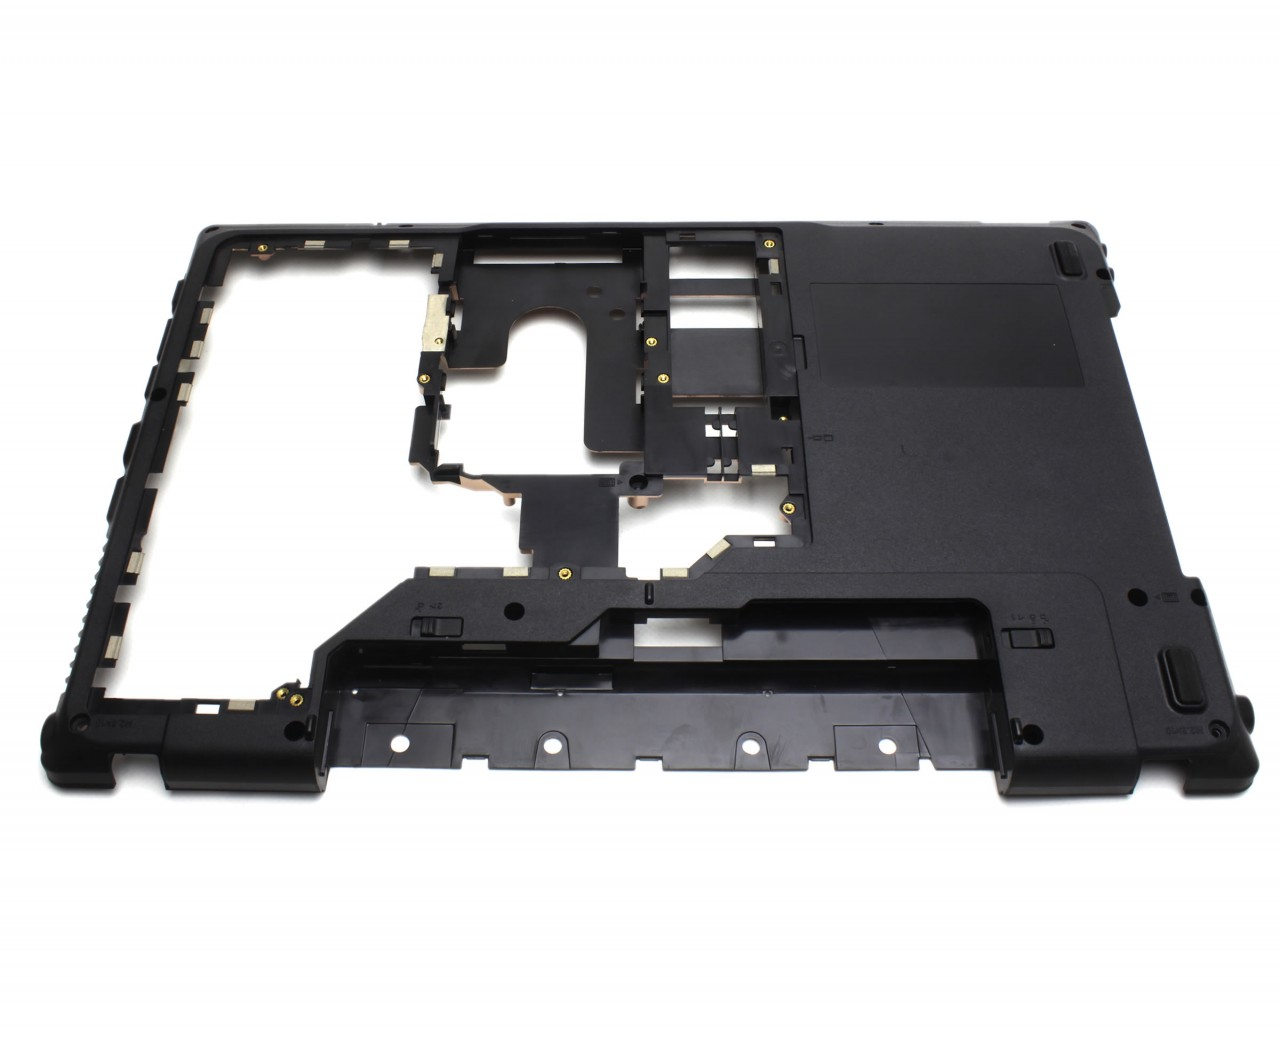 Bottom Case Lenovo 31042407 Carcasa Inferioara Neagra imagine powerlaptop.ro 2021